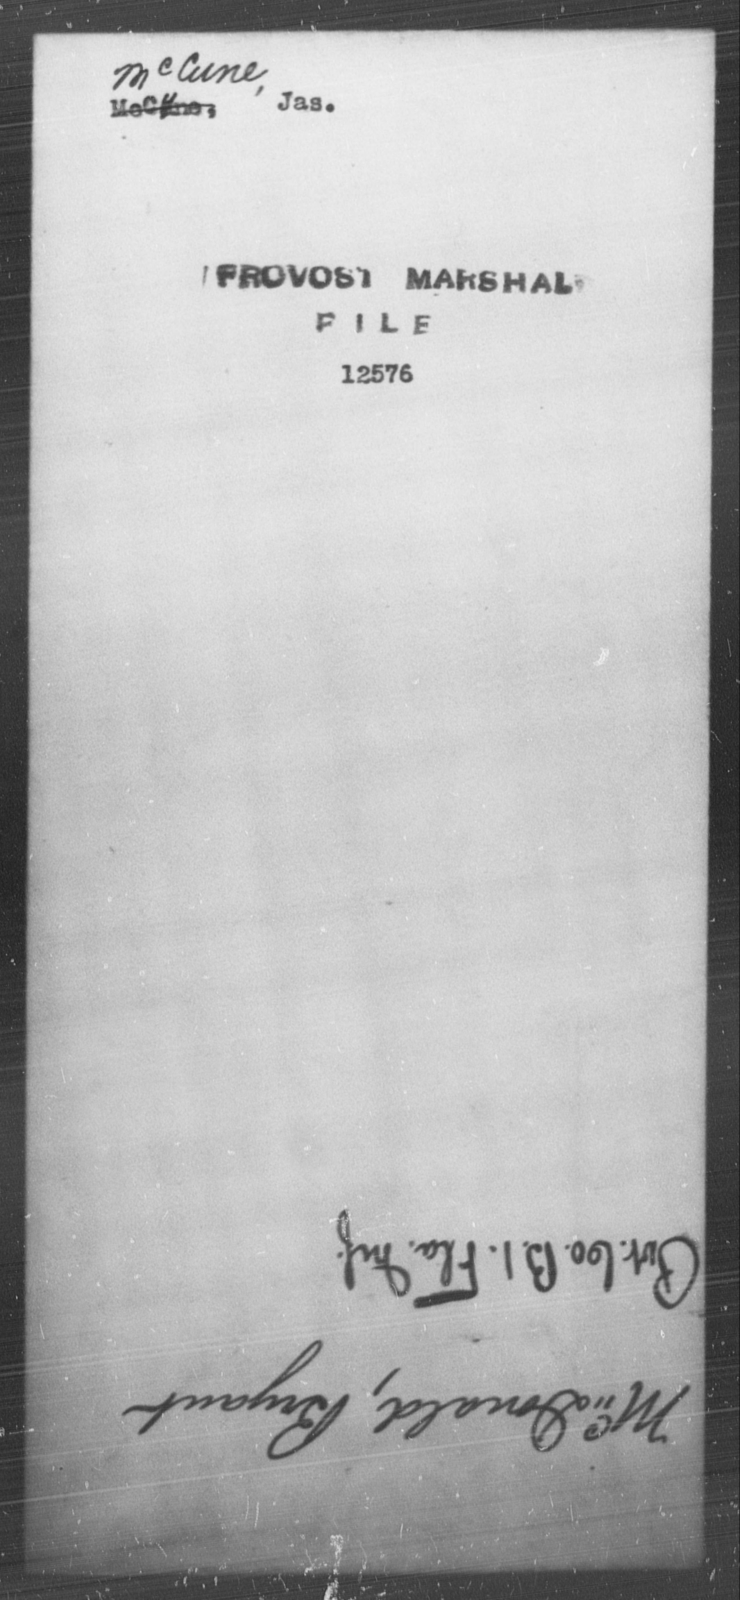 McCune, Jas - State: [Blank] - Year: [Blank]